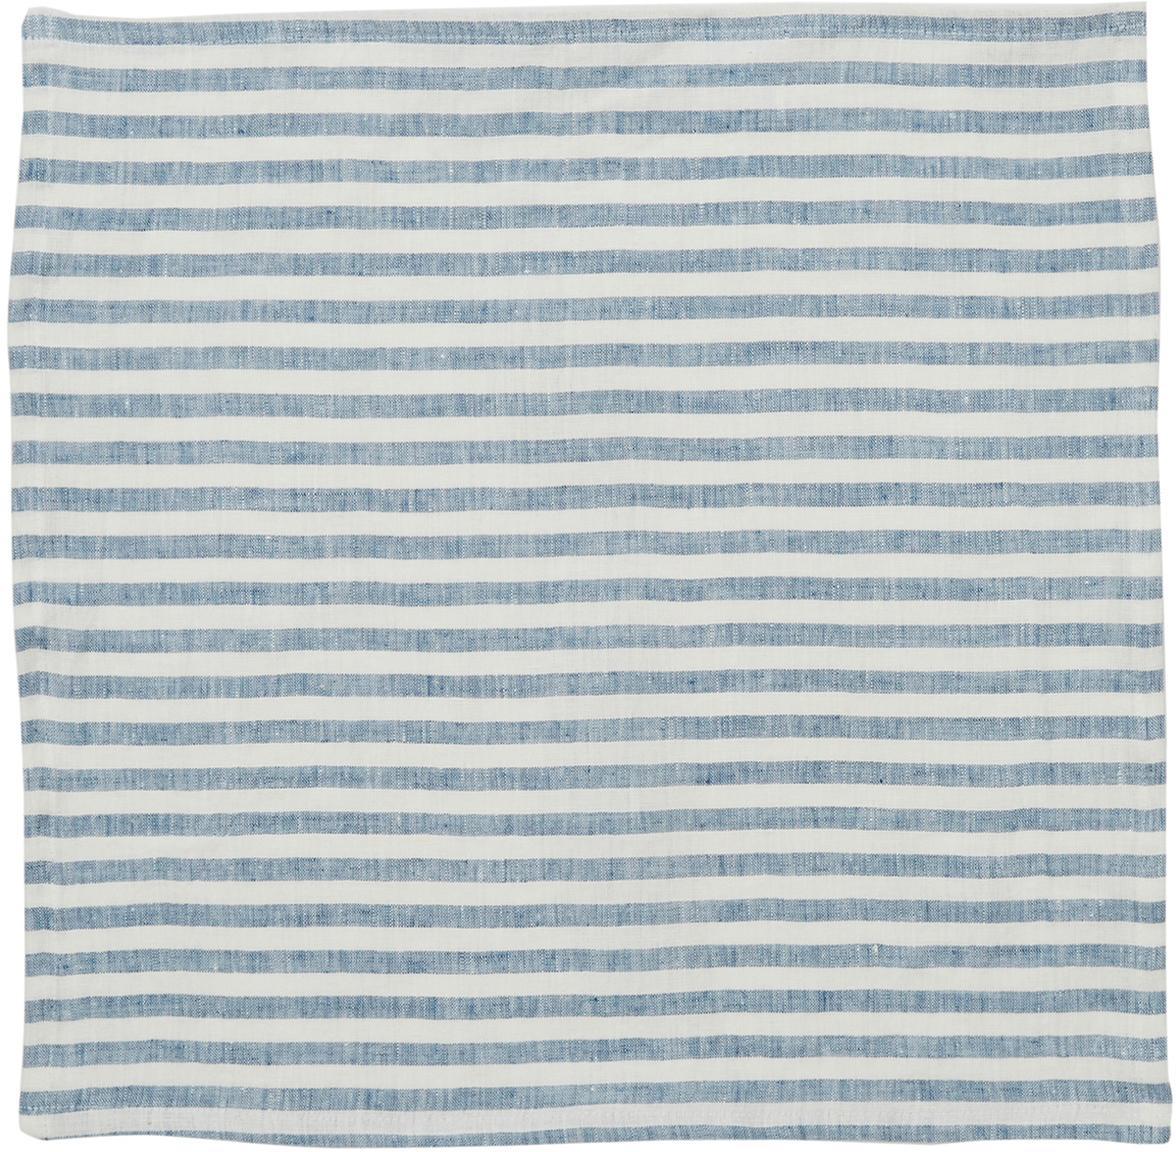 Leinen-Servietten Solami, 6 Stück, Leinen, Hellblau, Weiss, 46 x 46 cm